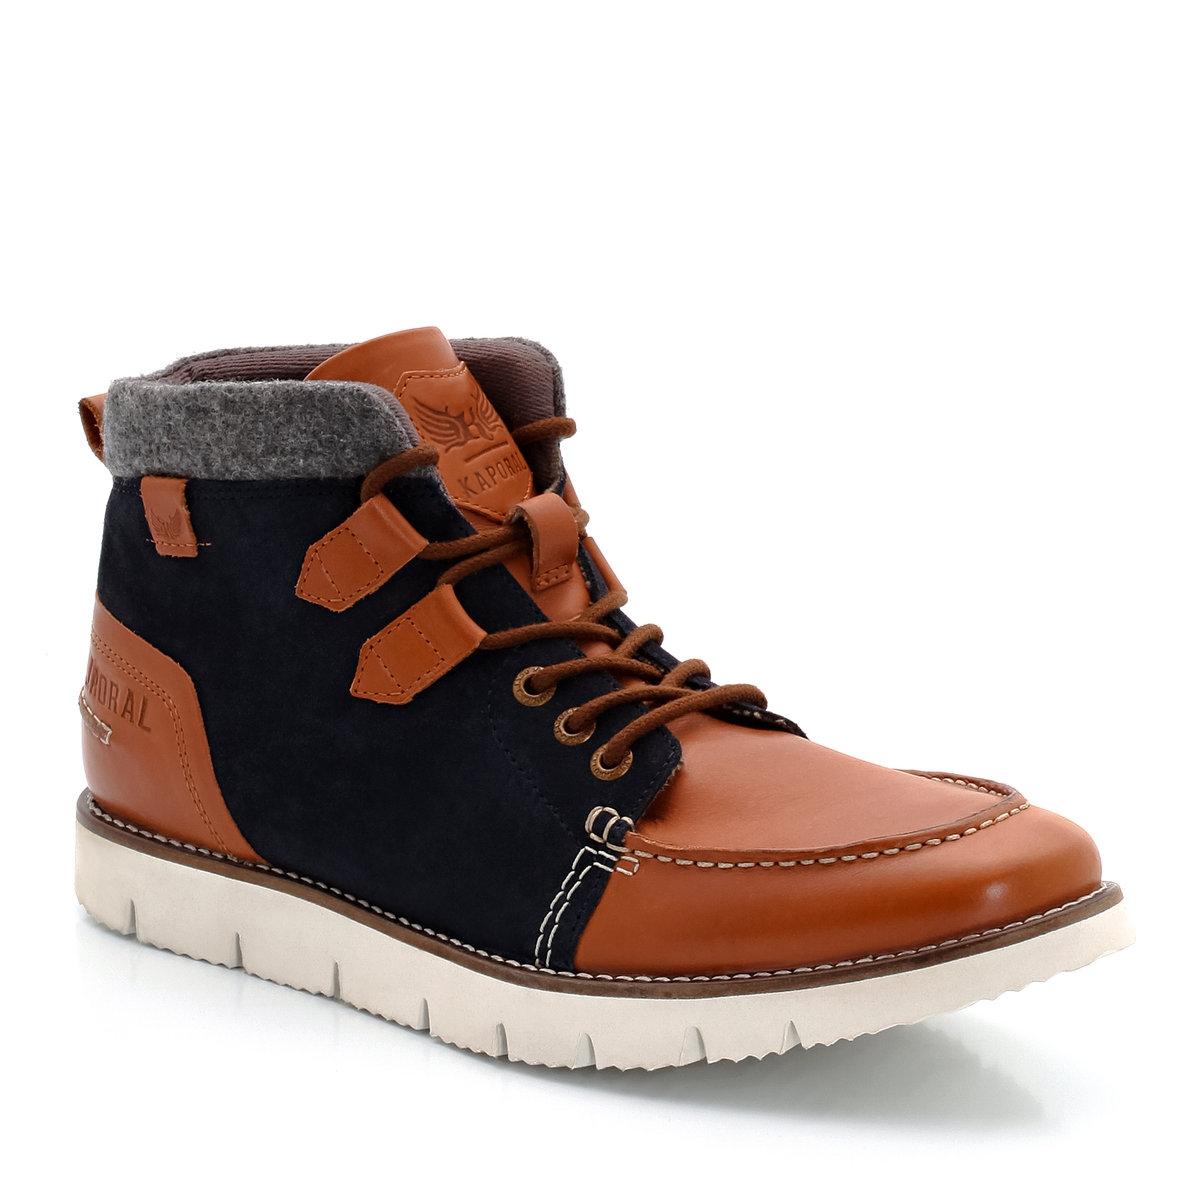 Ботинки из кожи и спилка на шнурках от KAPORAL 5